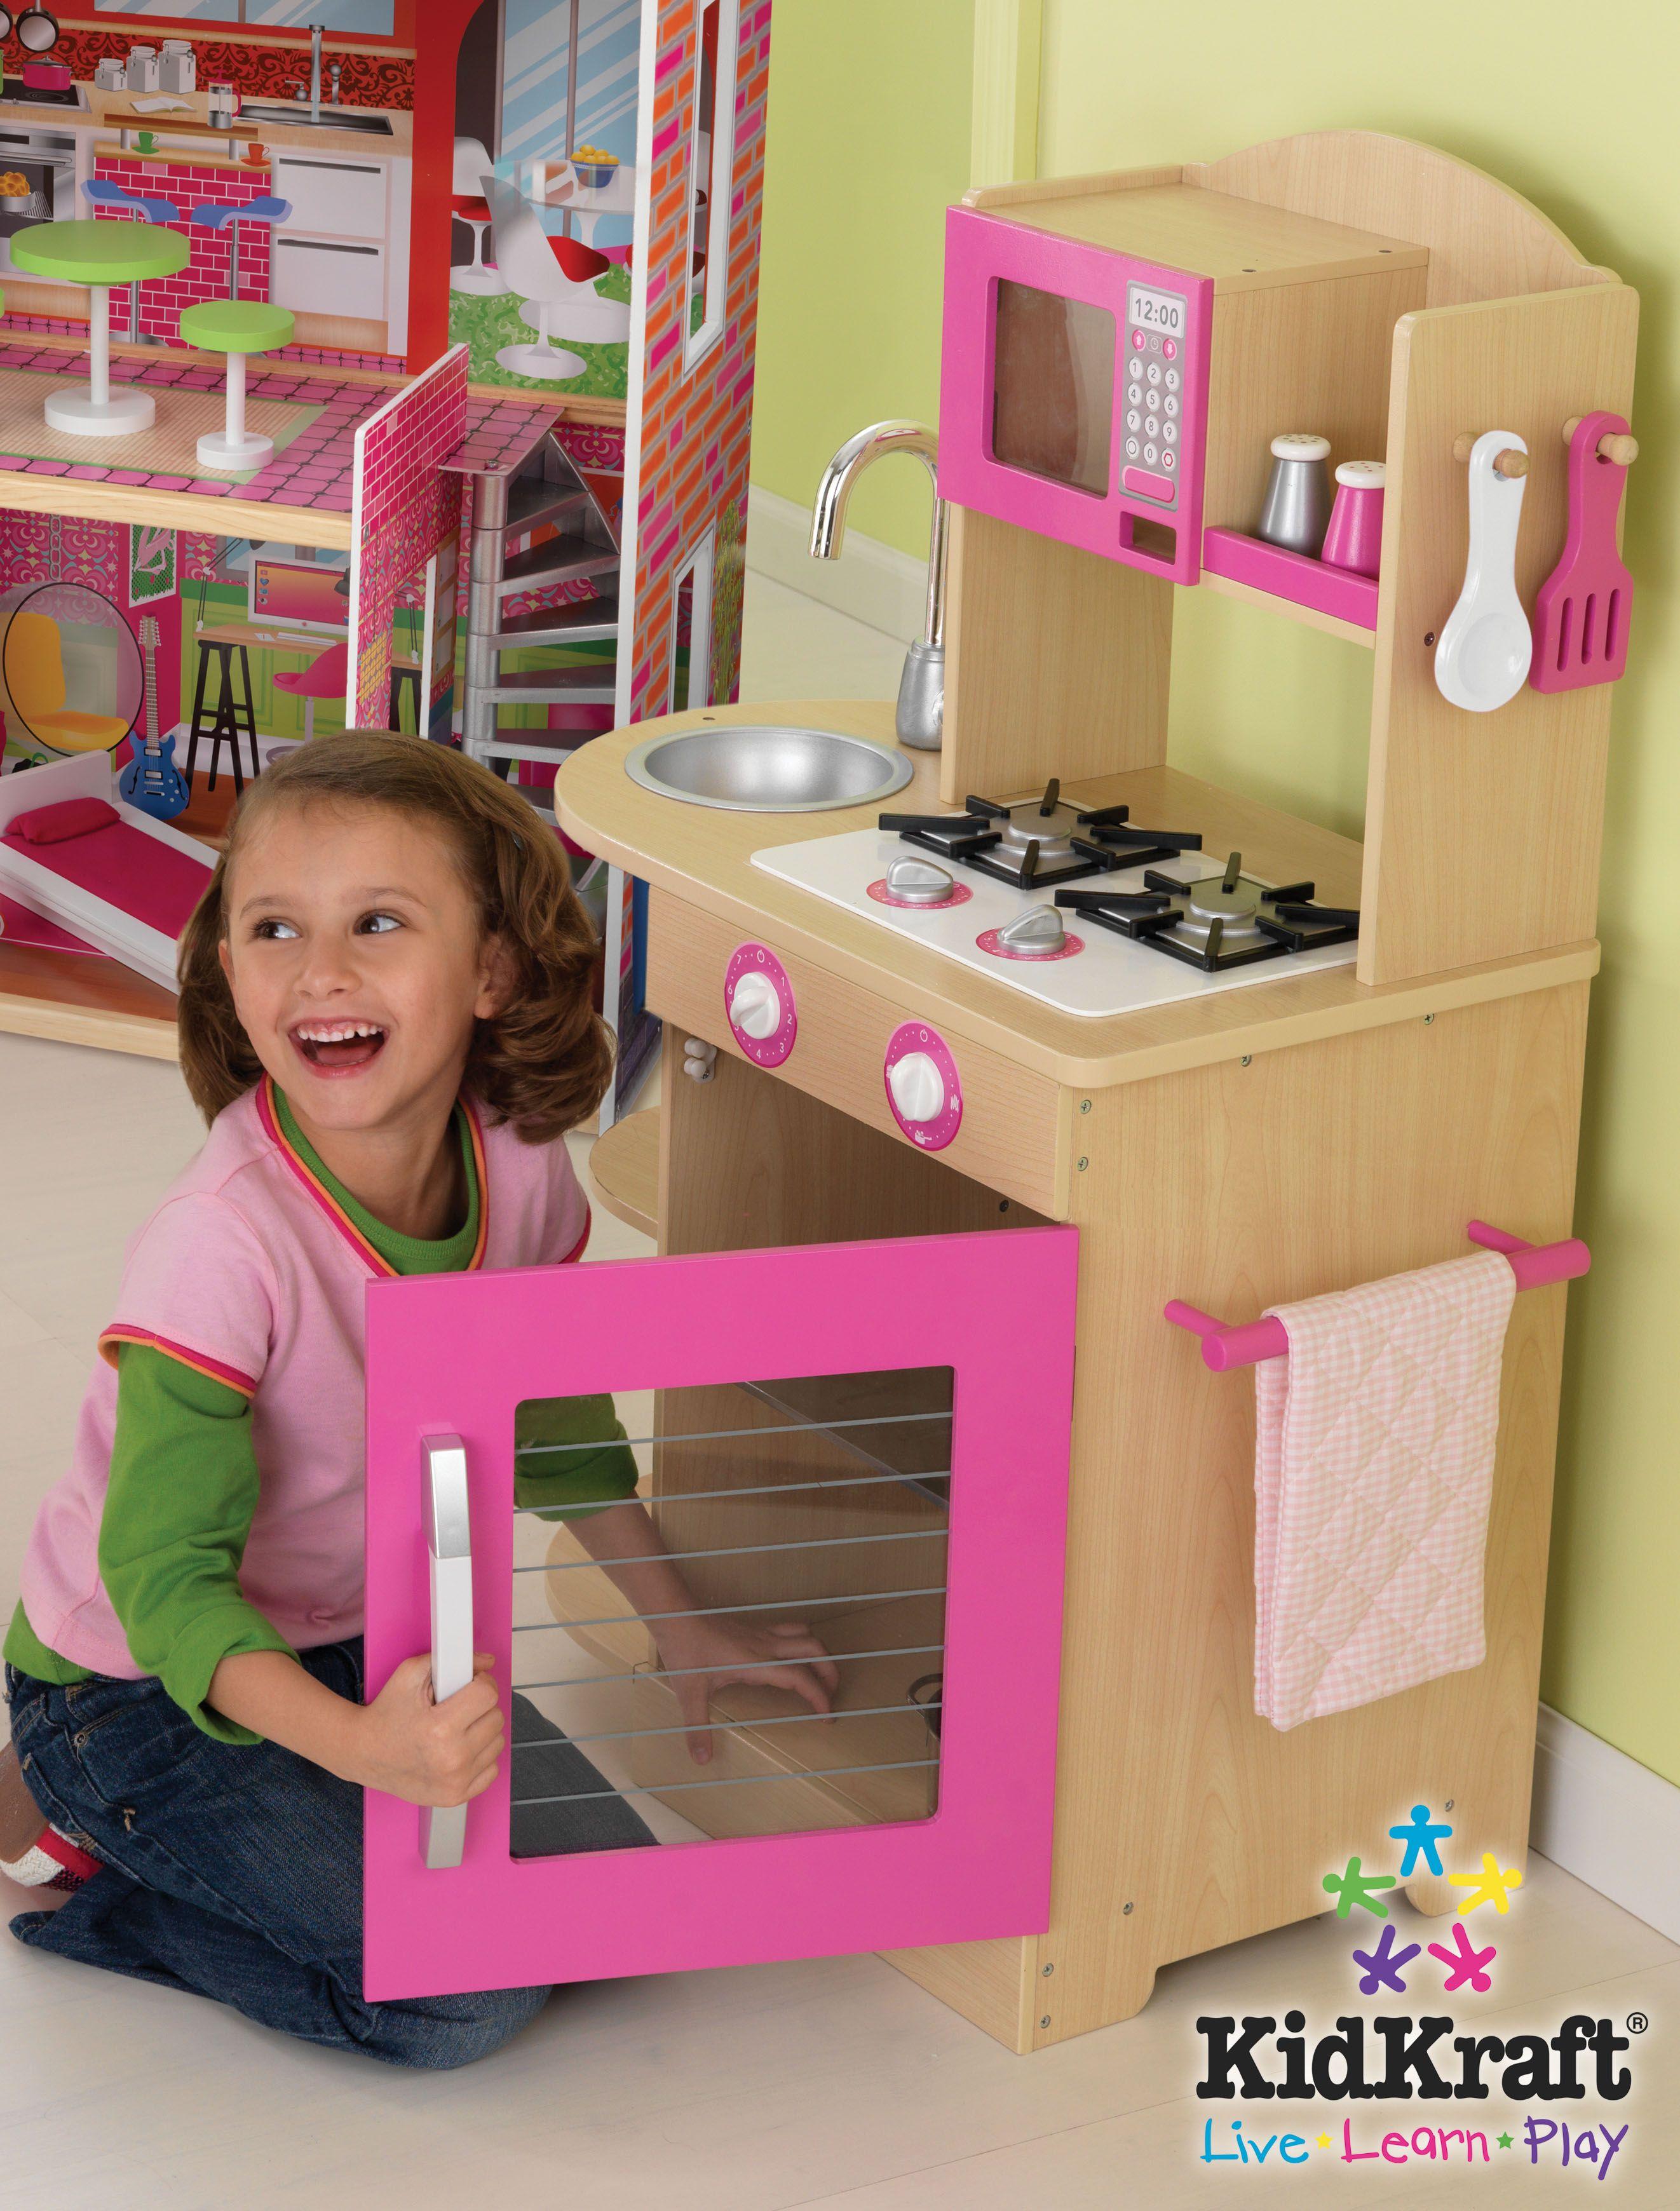 Kids Kitchen Set Kidkraft Pink Wooden For